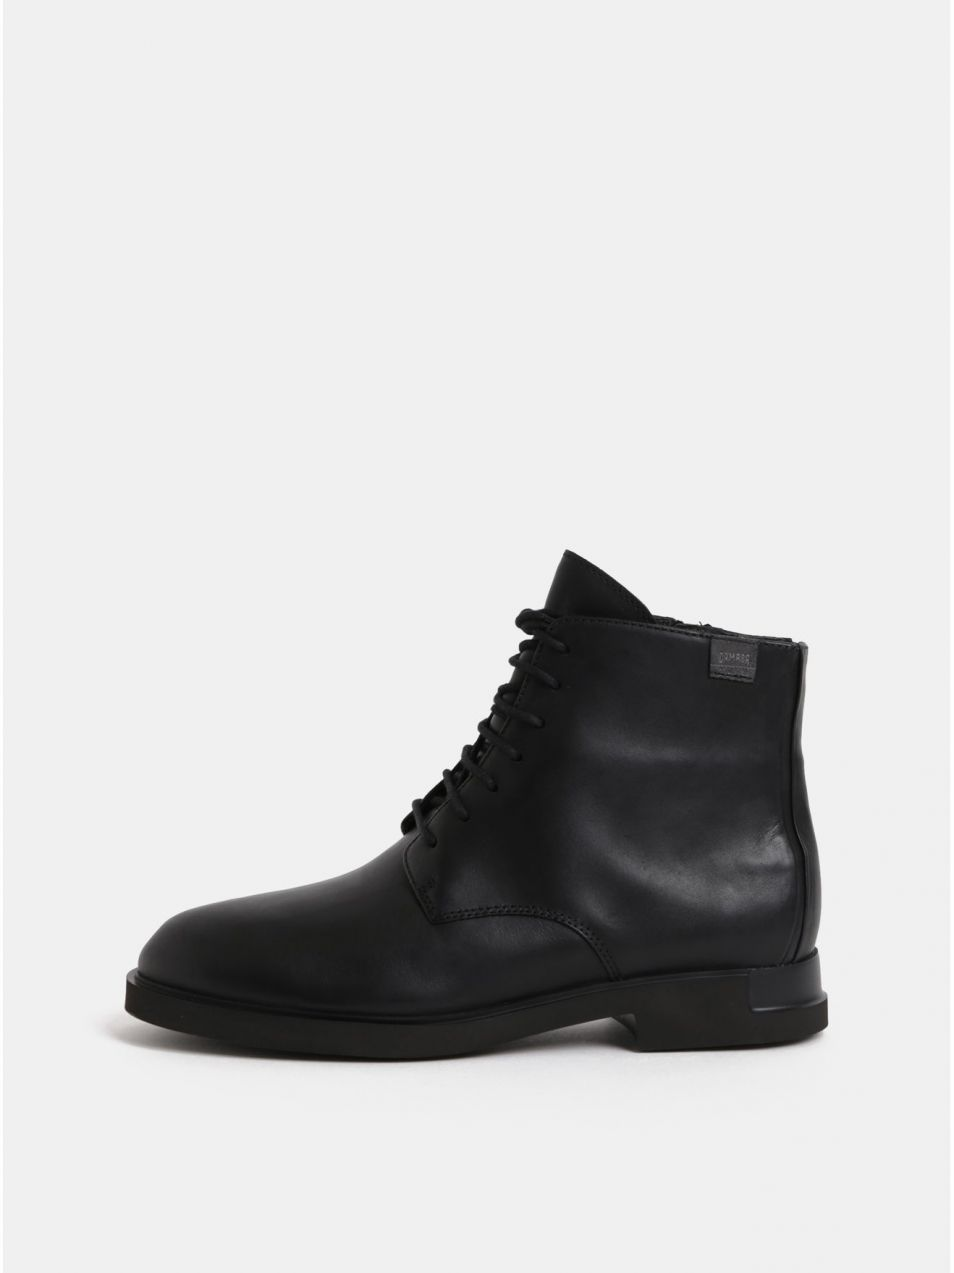 cdae0a5c51 Čierne dámske kožené členkové topánky Camper Iman značky Camper - Lovely.sk